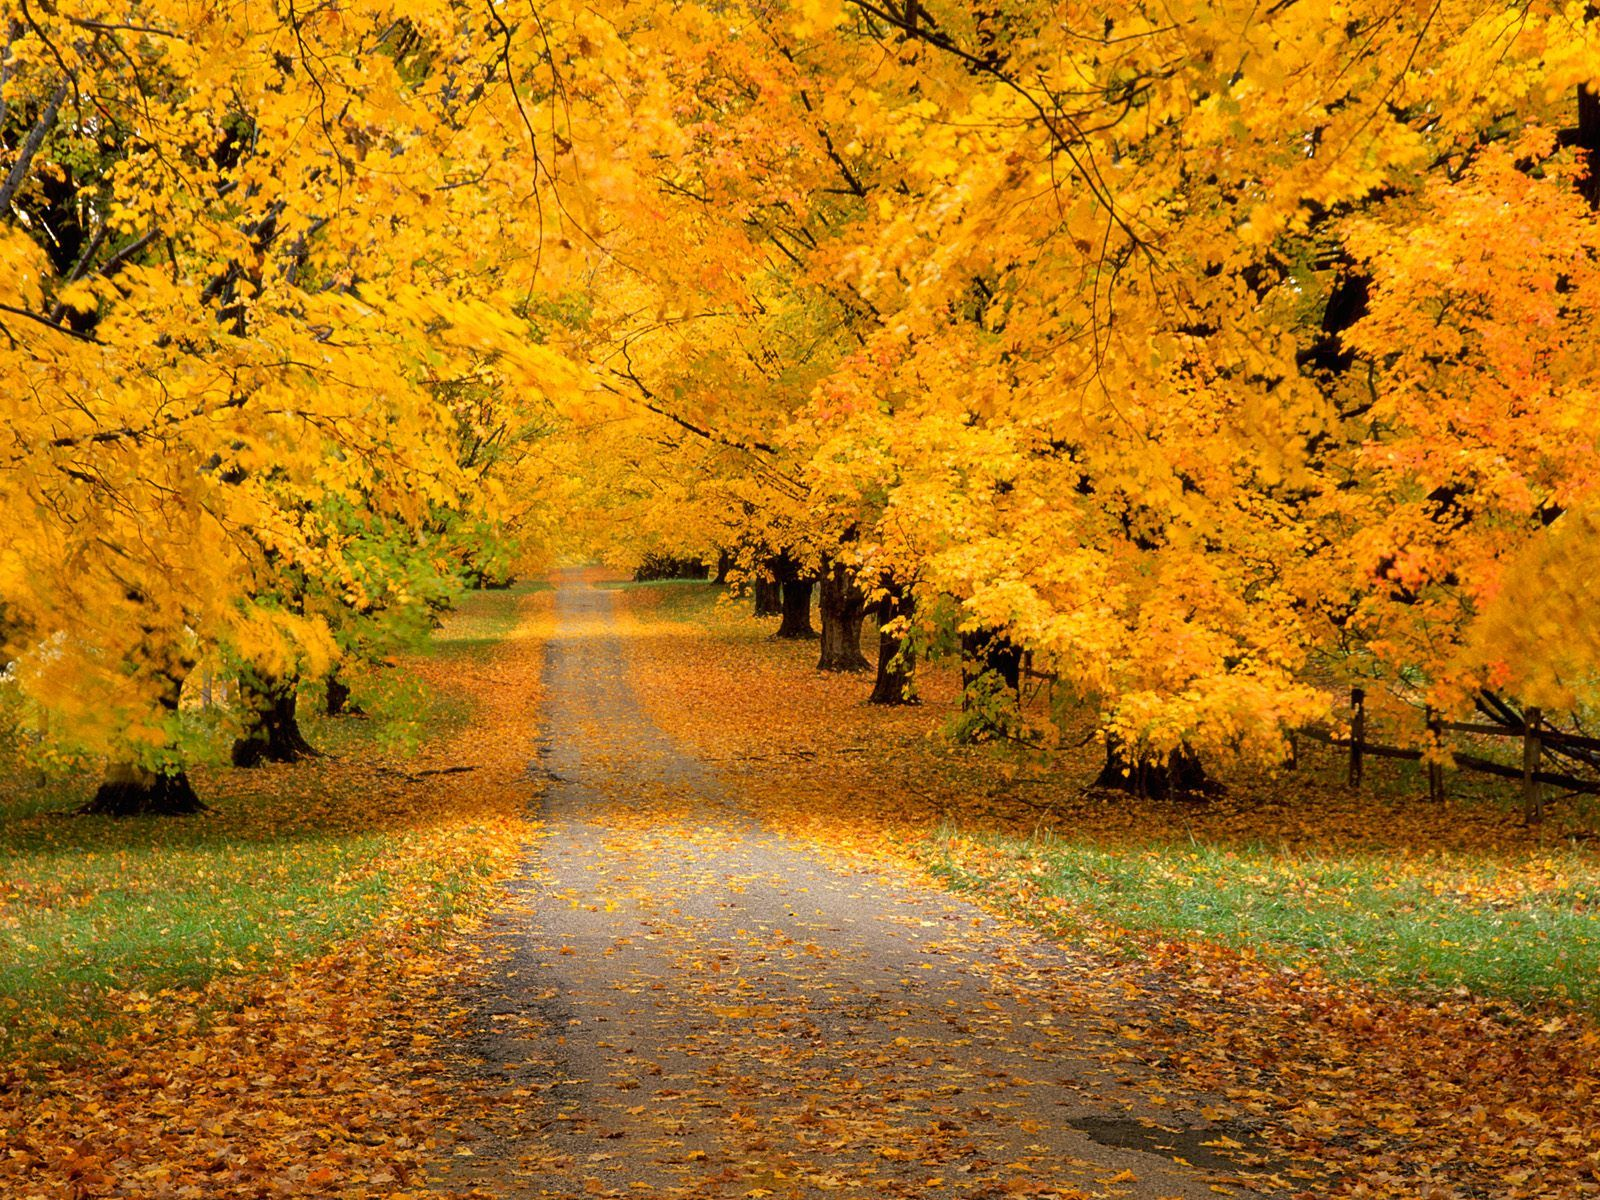 Beautiful Fall Desktop Wallpaper | ... desktop autumn wallpaper hd widescreen desktop autumn wallpaper hd